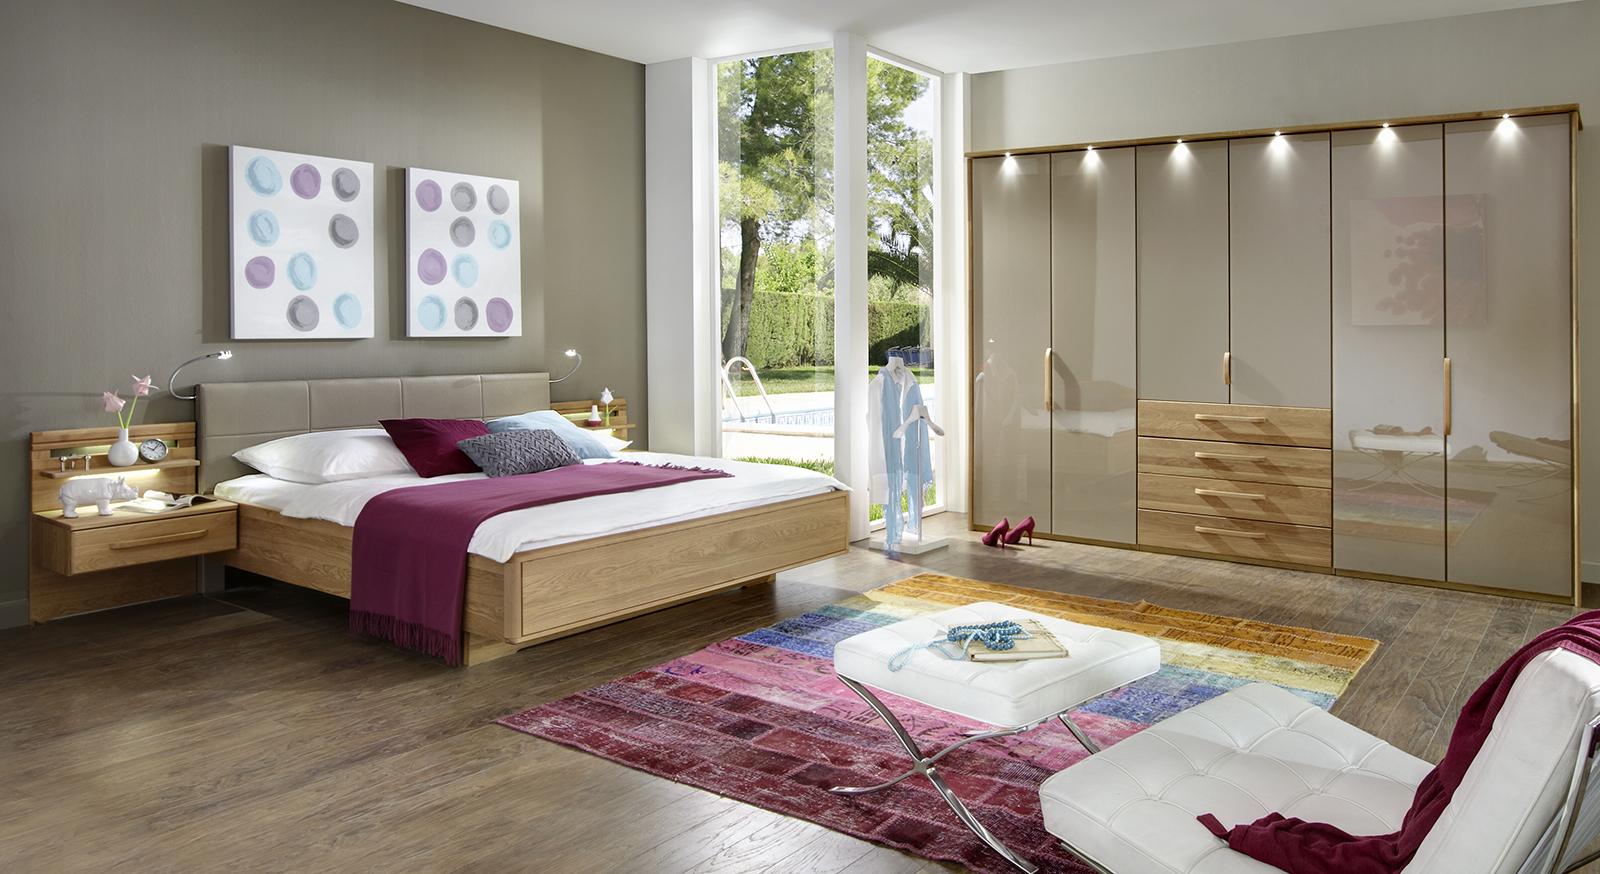 edles komplett schlafzimmer mit schwebebett morley sahara. Black Bedroom Furniture Sets. Home Design Ideas